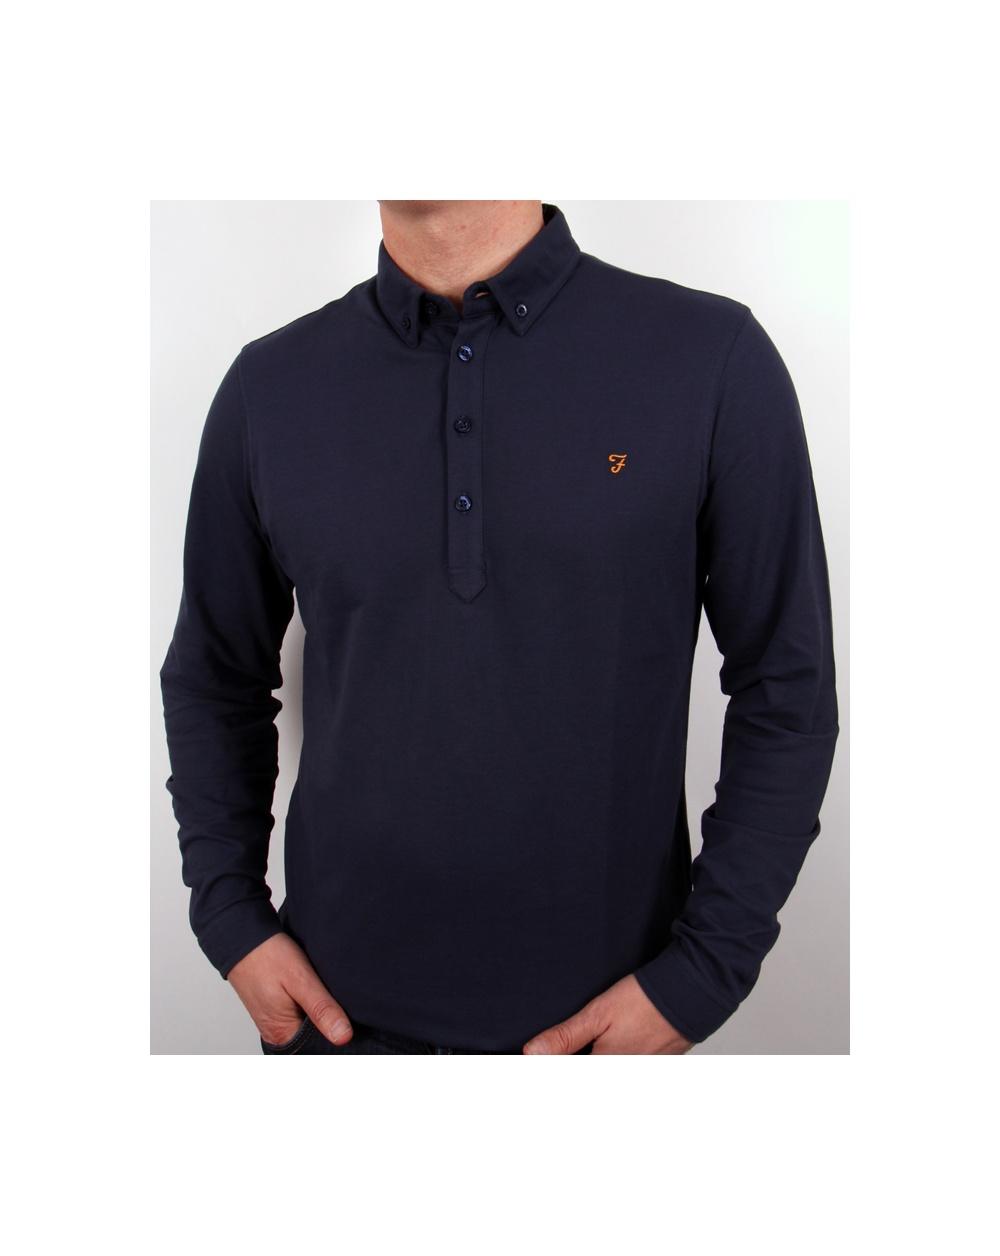 Farah Merriweather Polo Shirt Navy Blue Long Sleeve Cotton